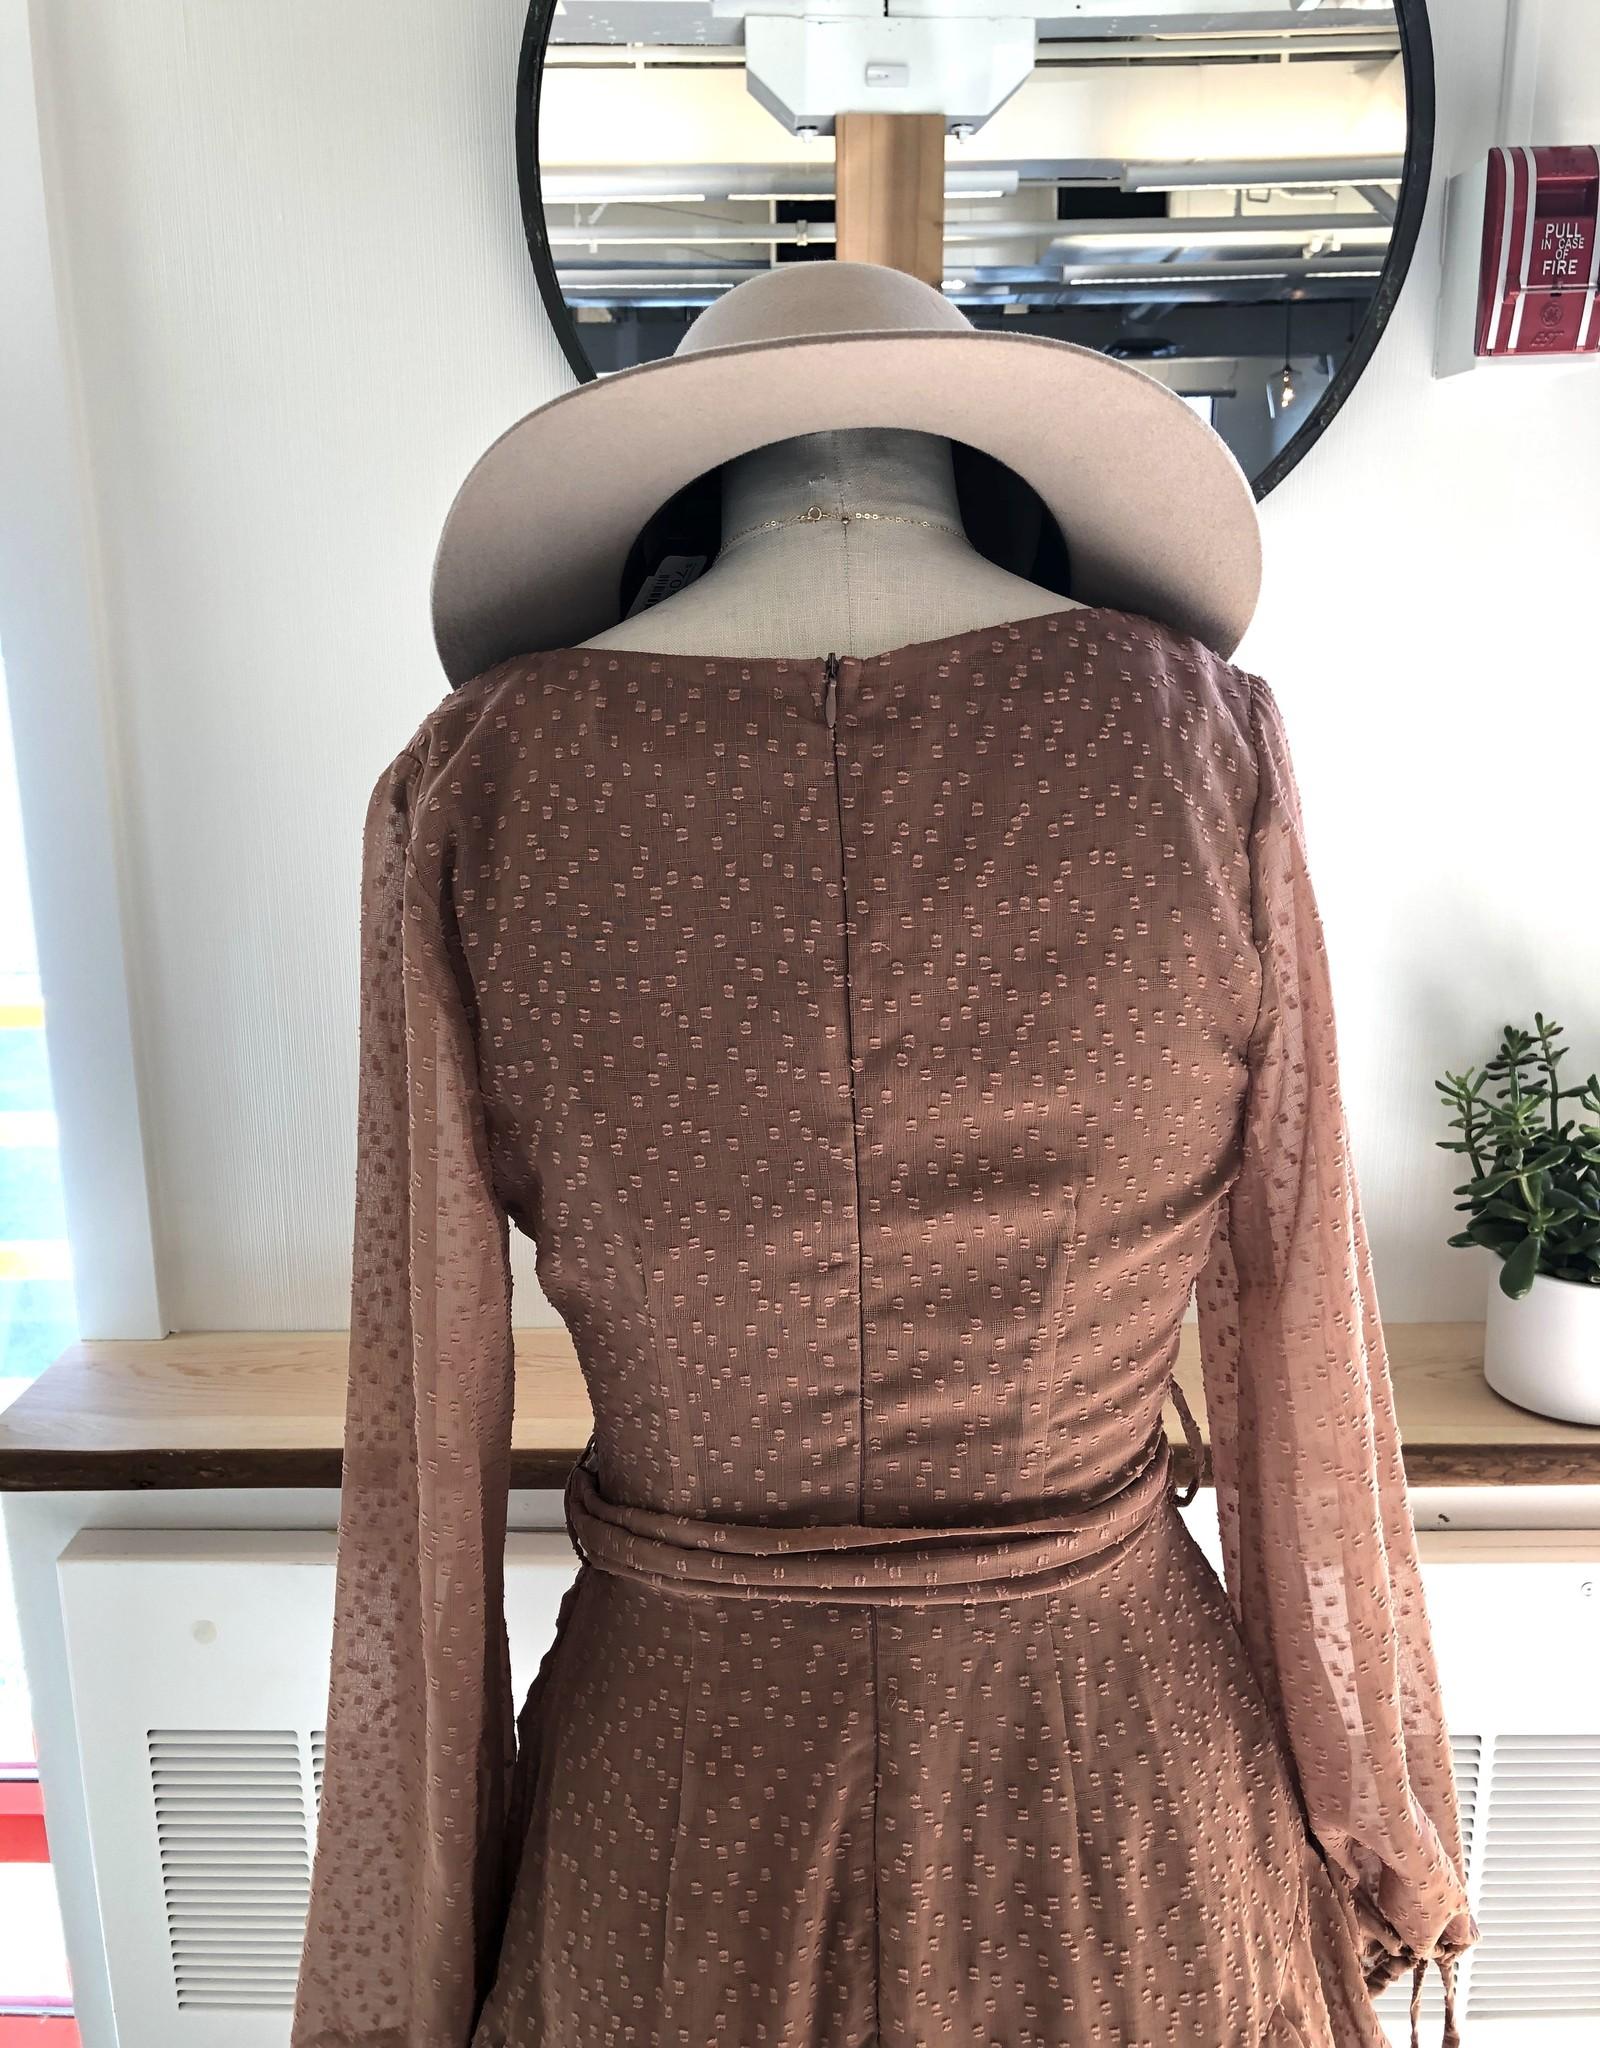 The Rose Dress